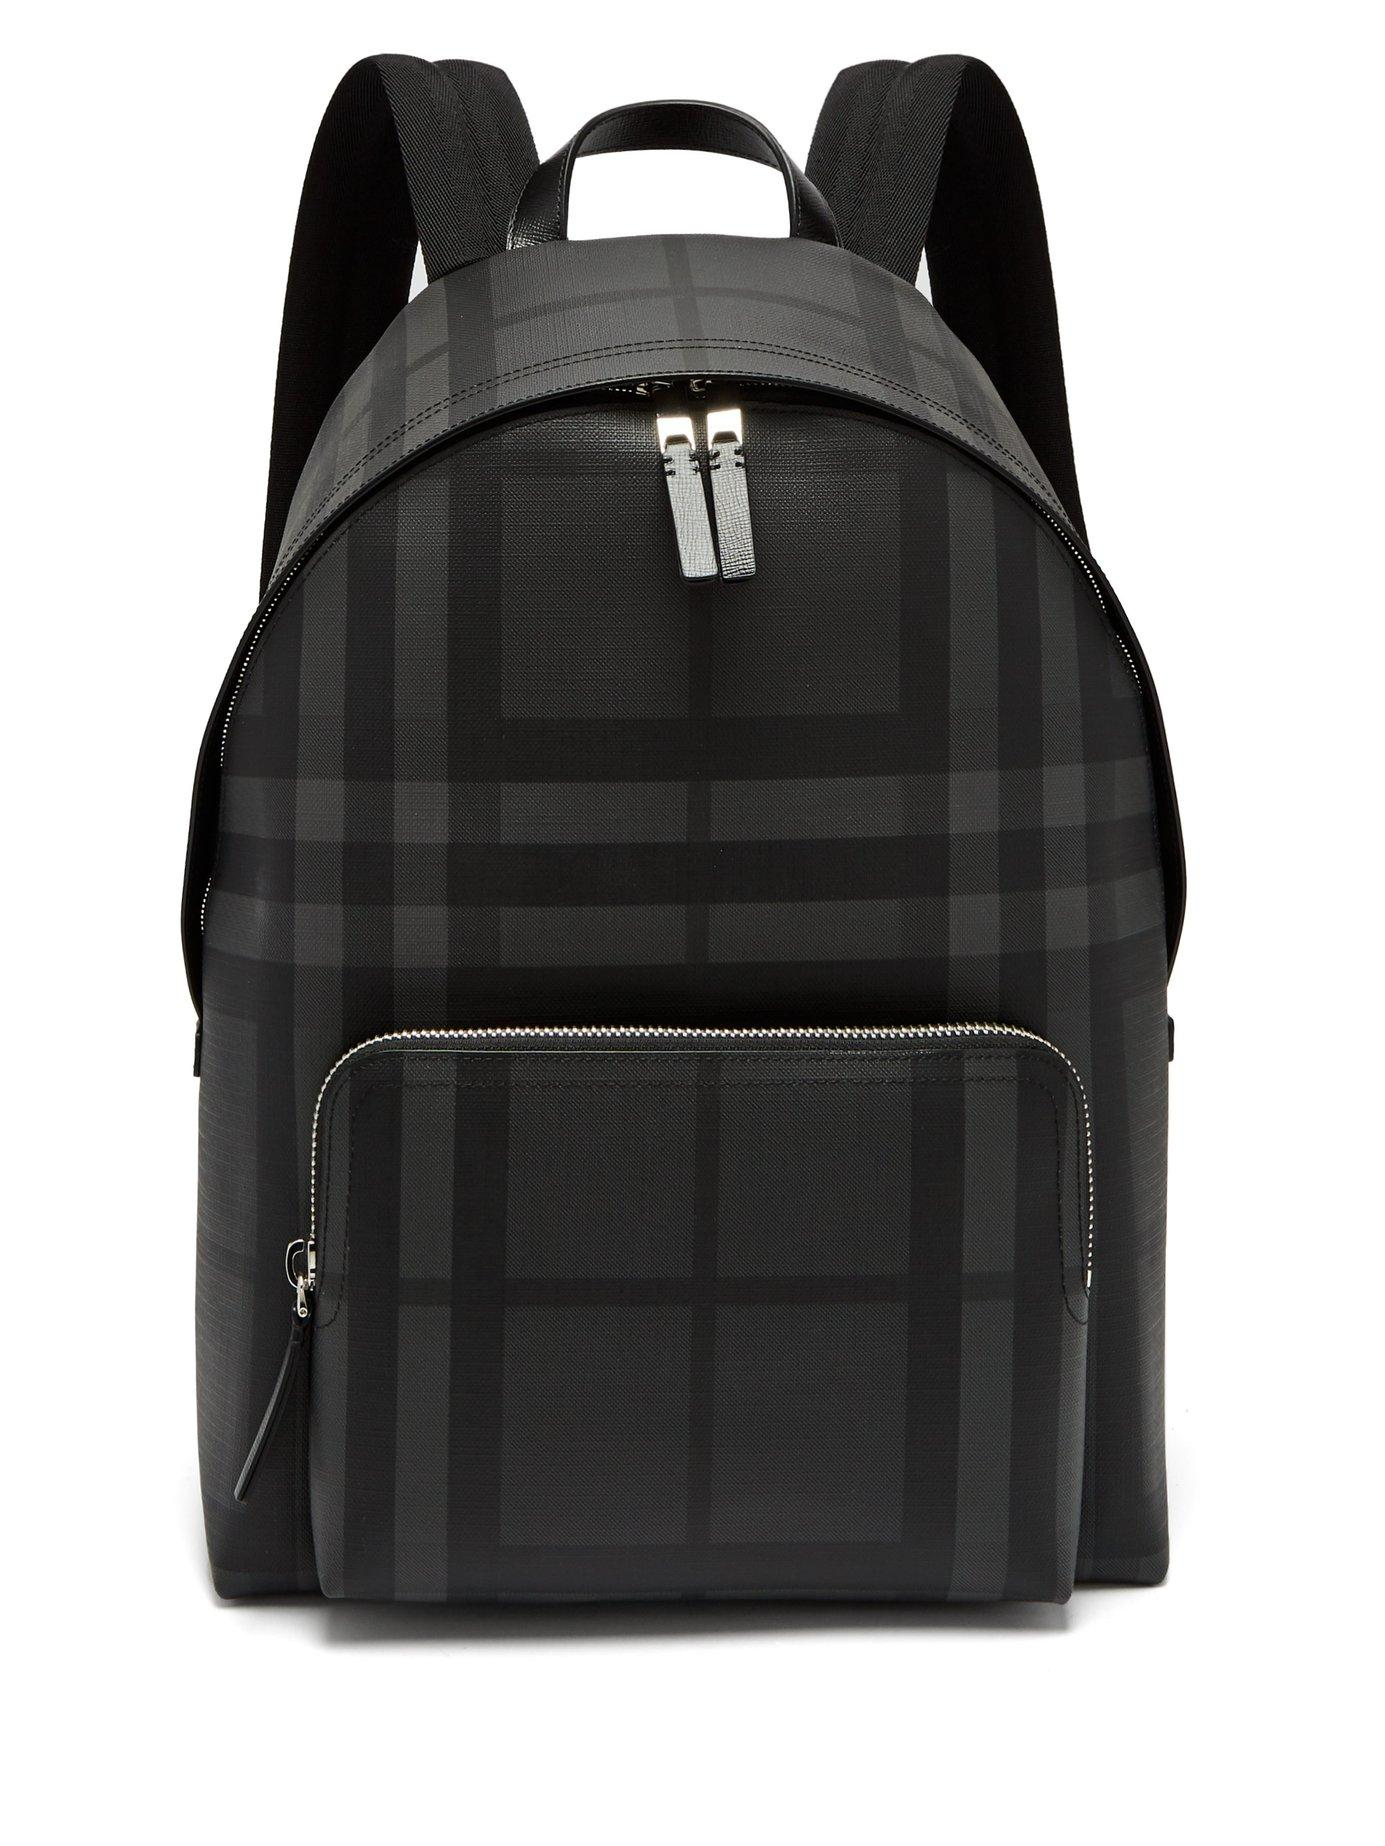 777f011b445a Burberry London-Check Pvc Backpack In Black Grey